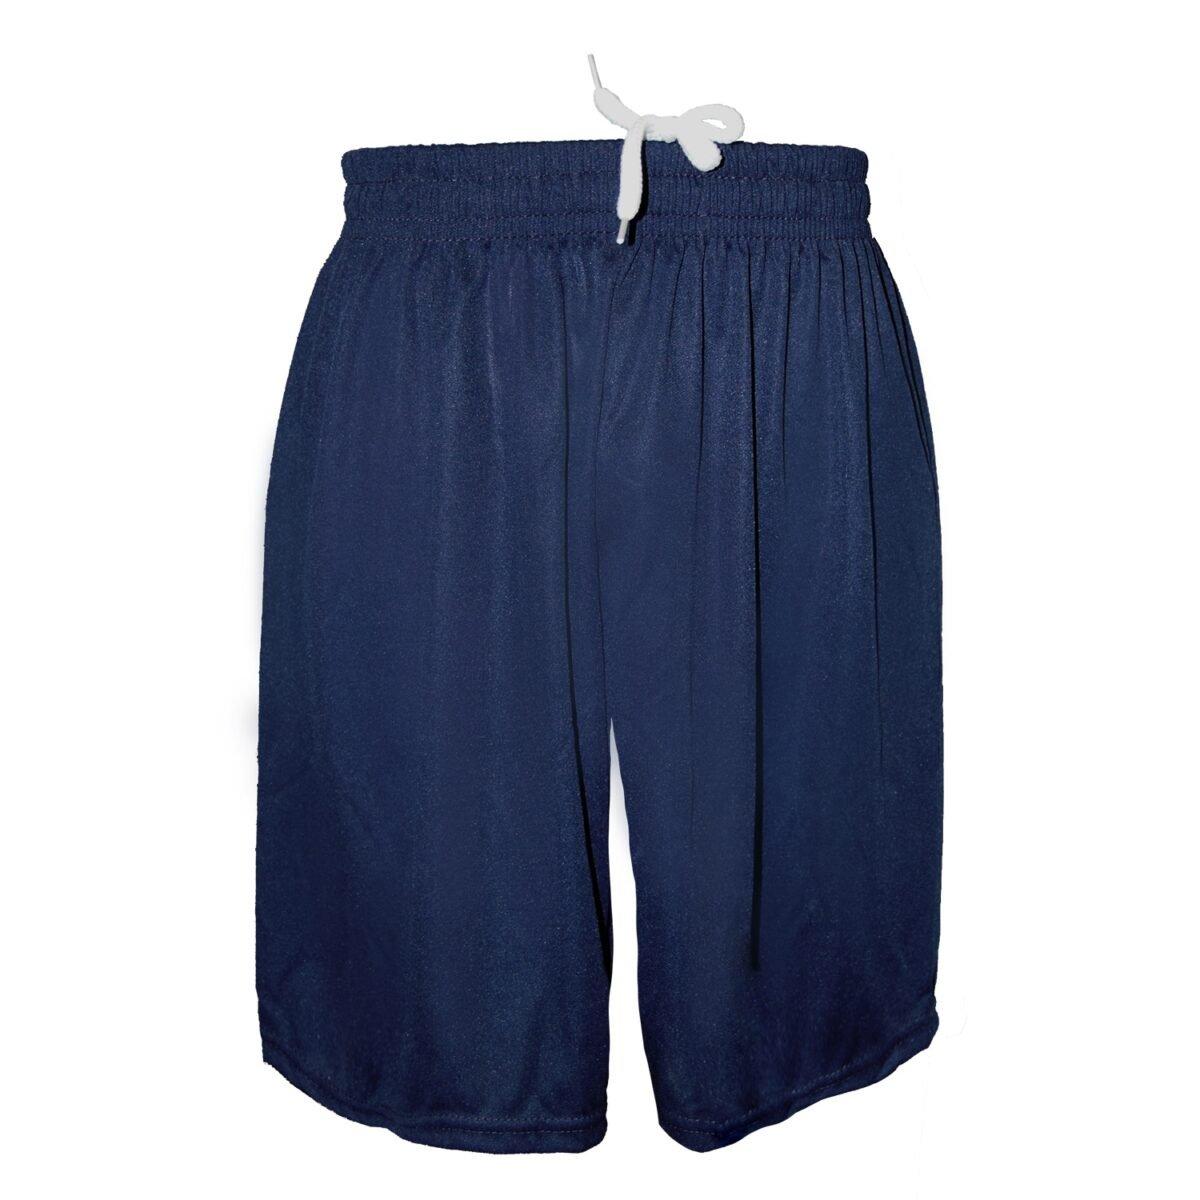 Pantaloncini blu navy